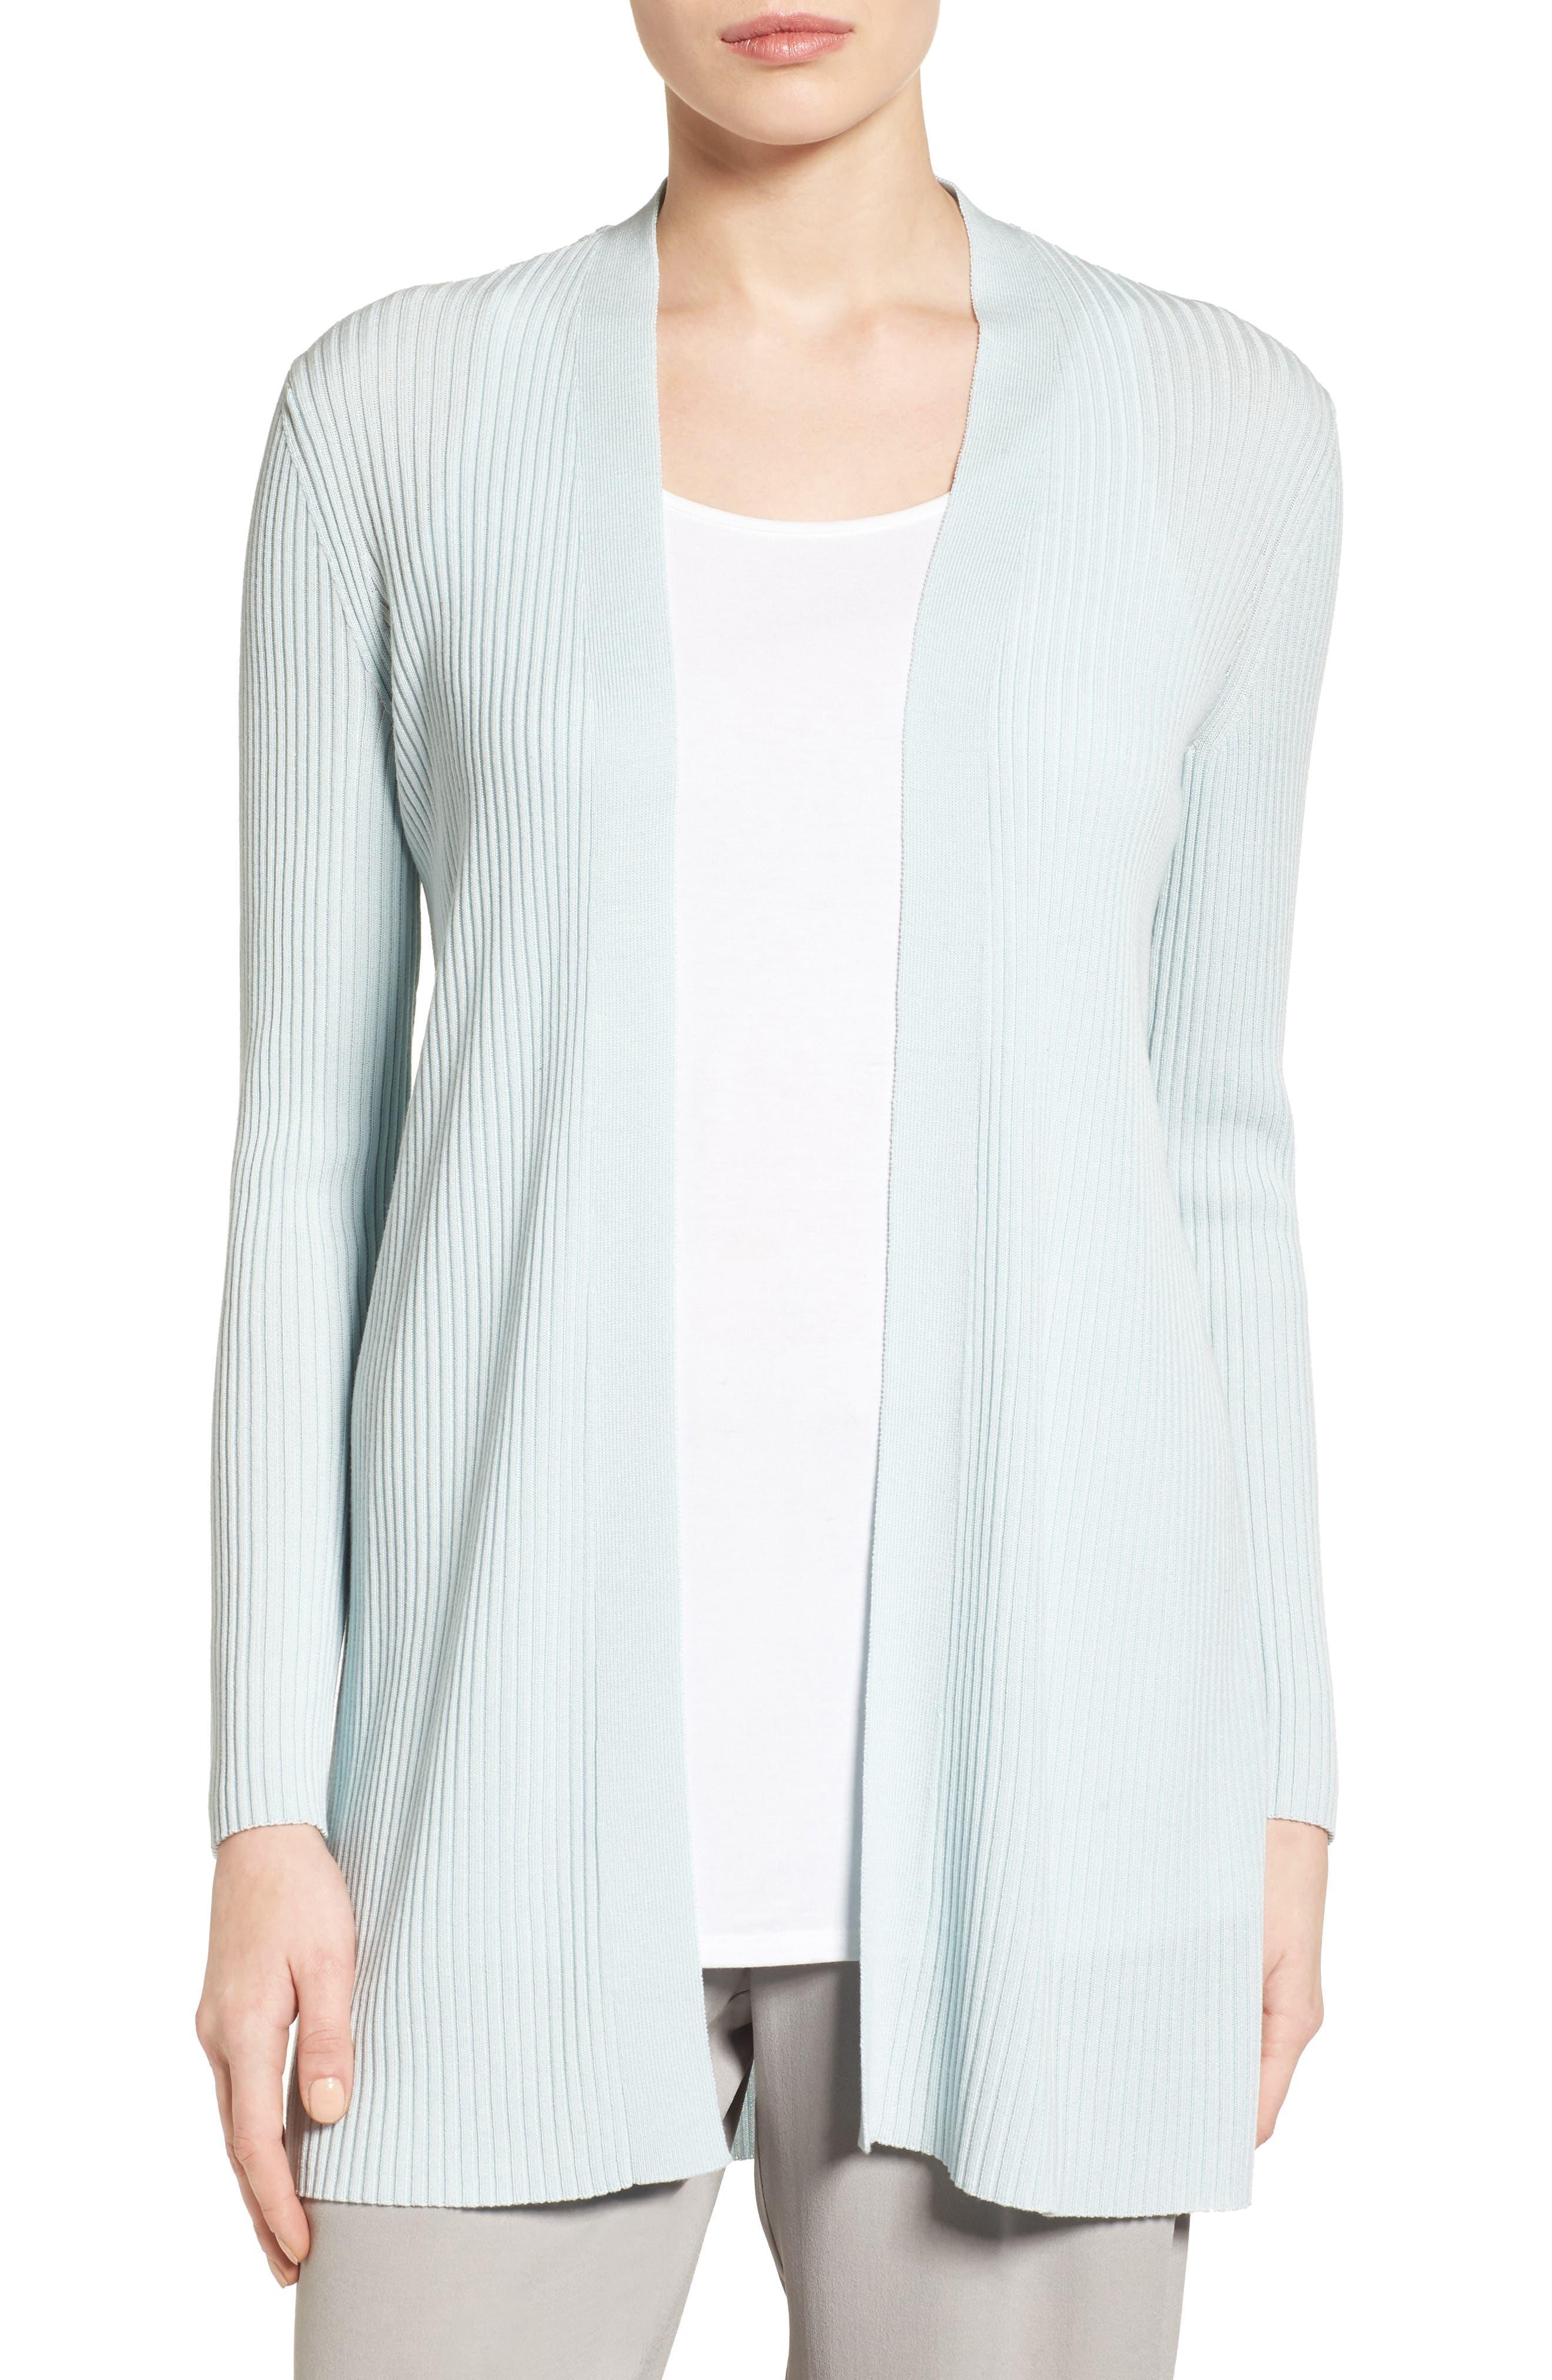 Alternate Image 1 Selected - Eileen Fisher Rib Knit Cardigan (Regular & Petite)